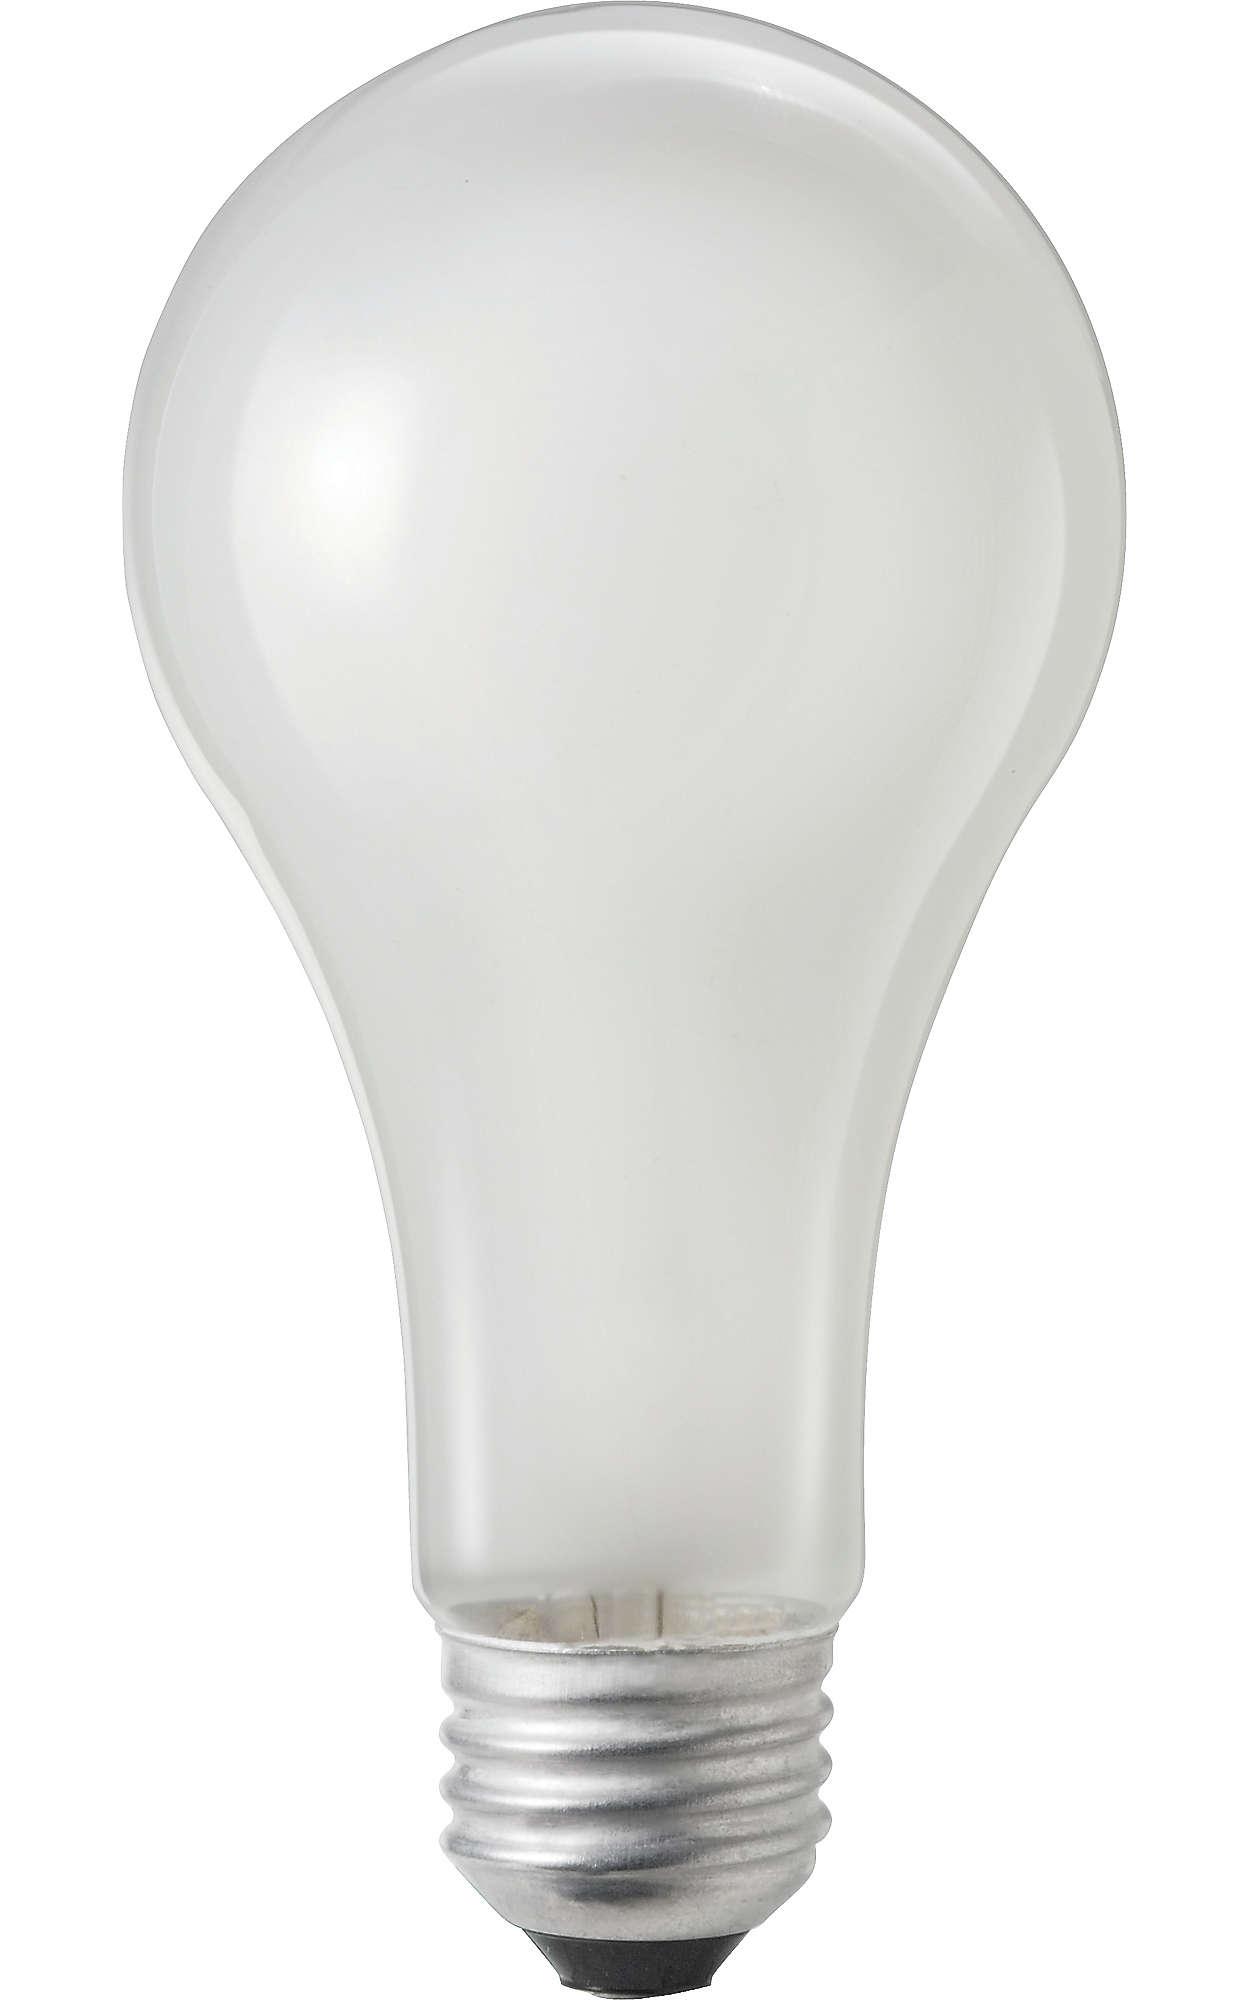 Energy saving alternatives